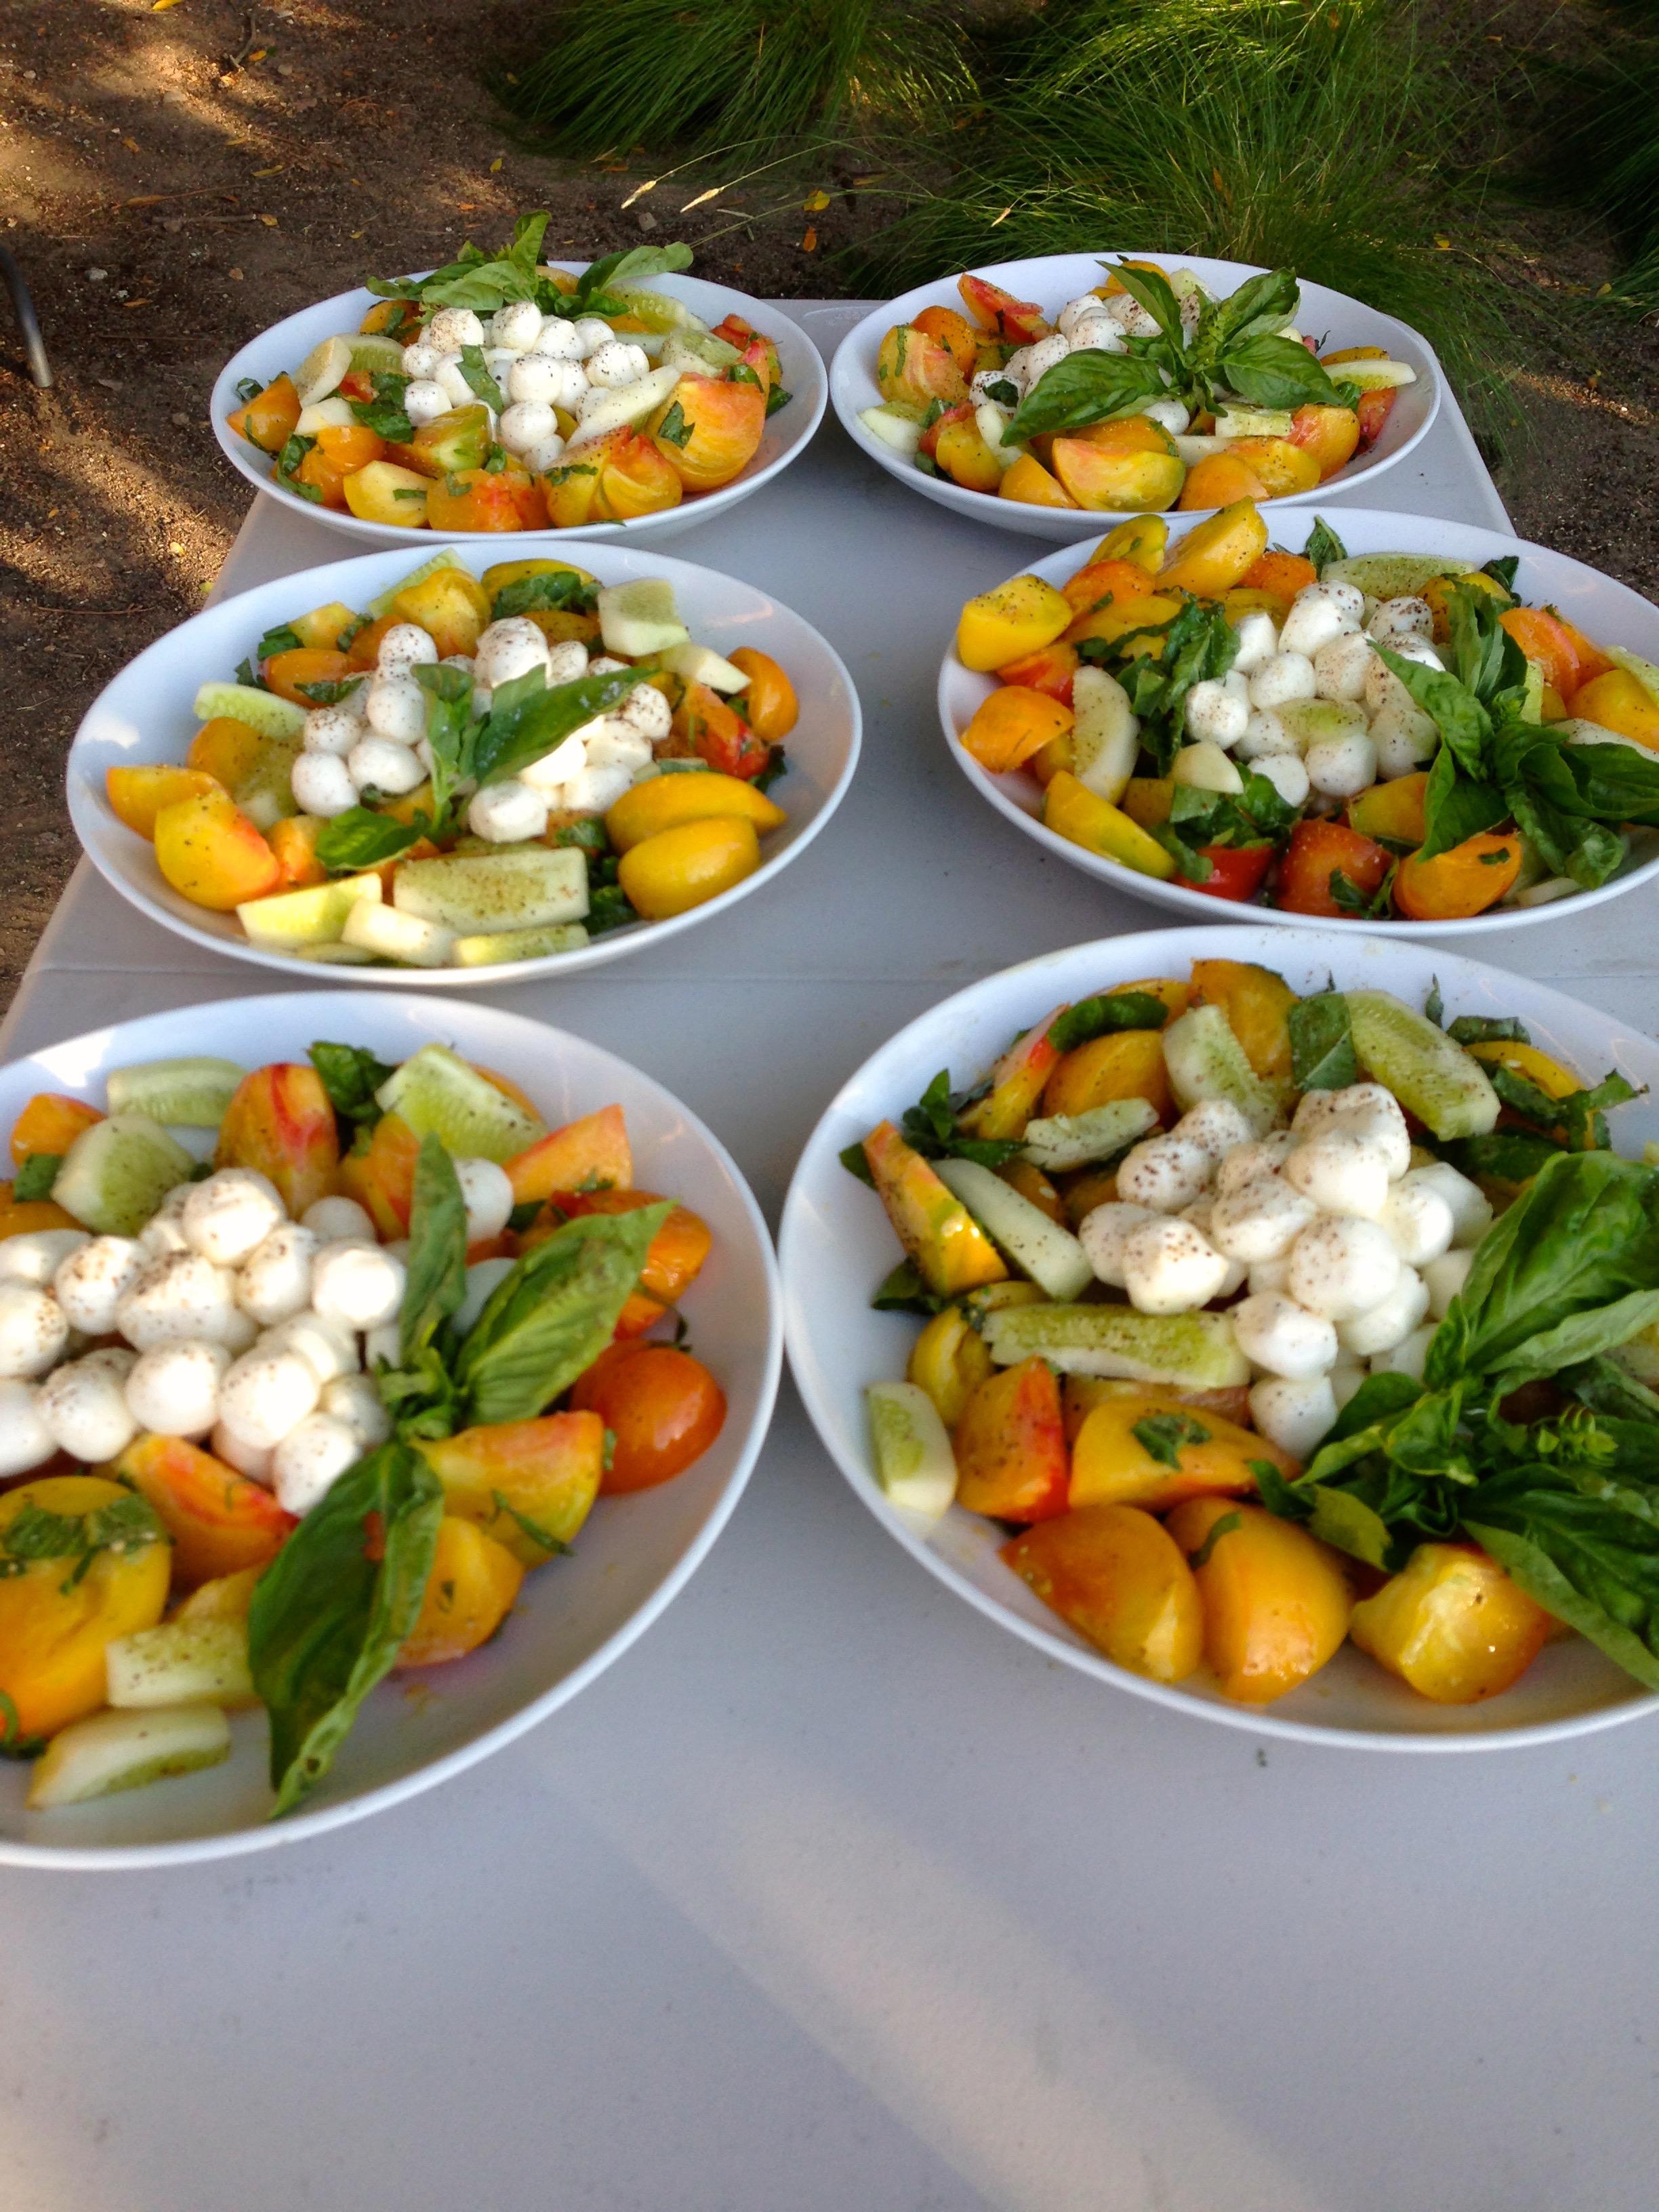 Sangiacomo Winery Heirloom Salad